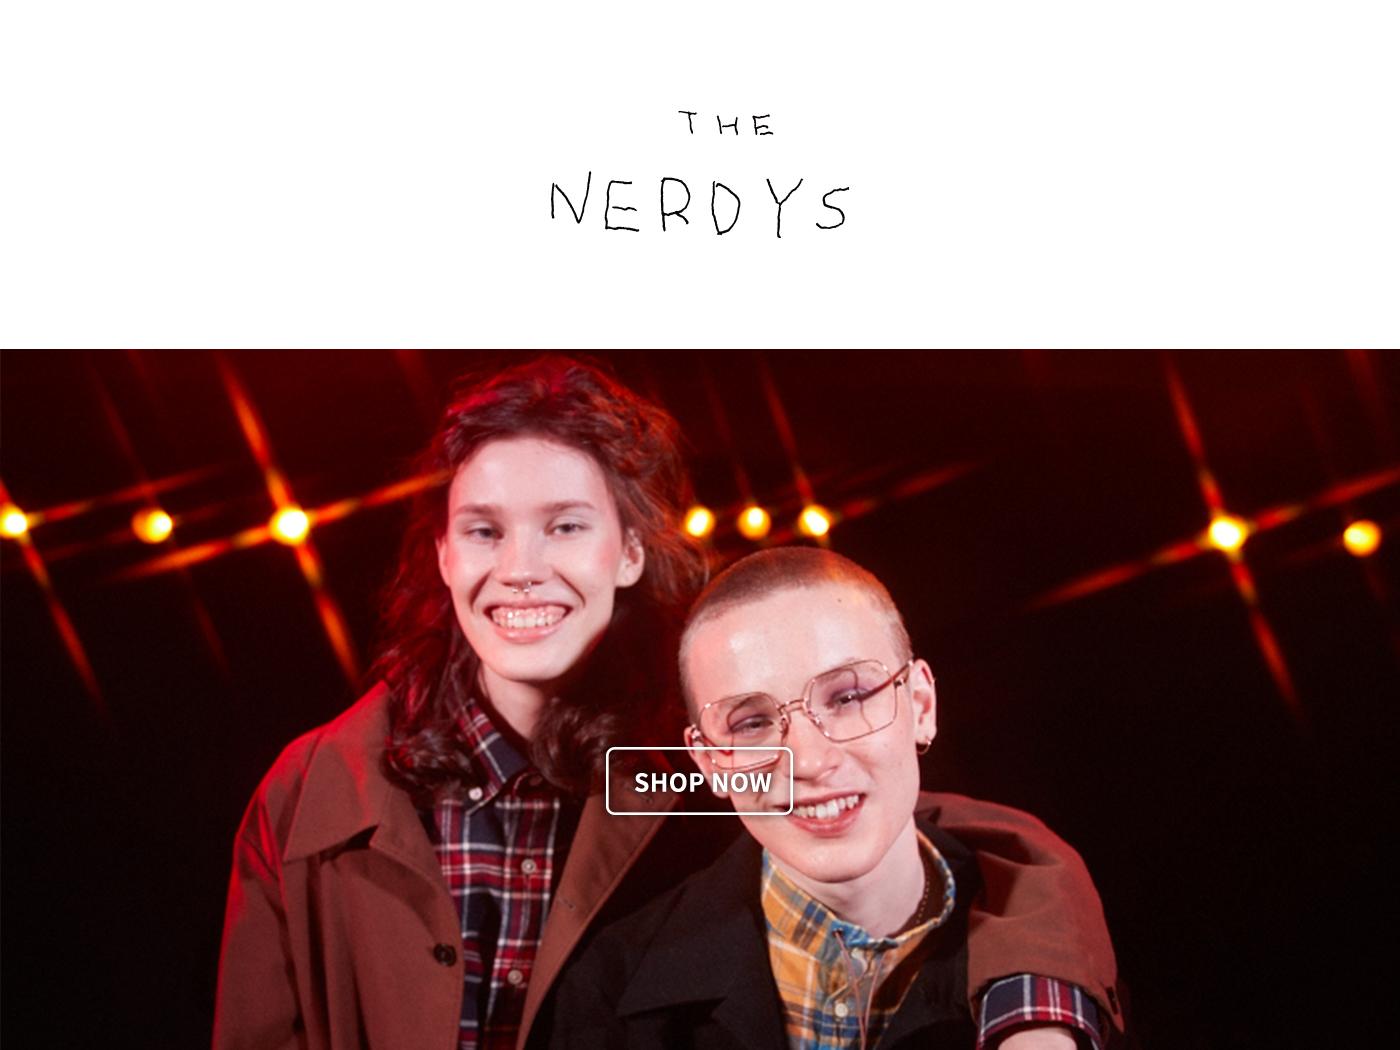 The NERDYS,NERD,阿久津誠治,書呆子,THE NERDYS 日本,THE NERDYS 台灣,ナーディーズ